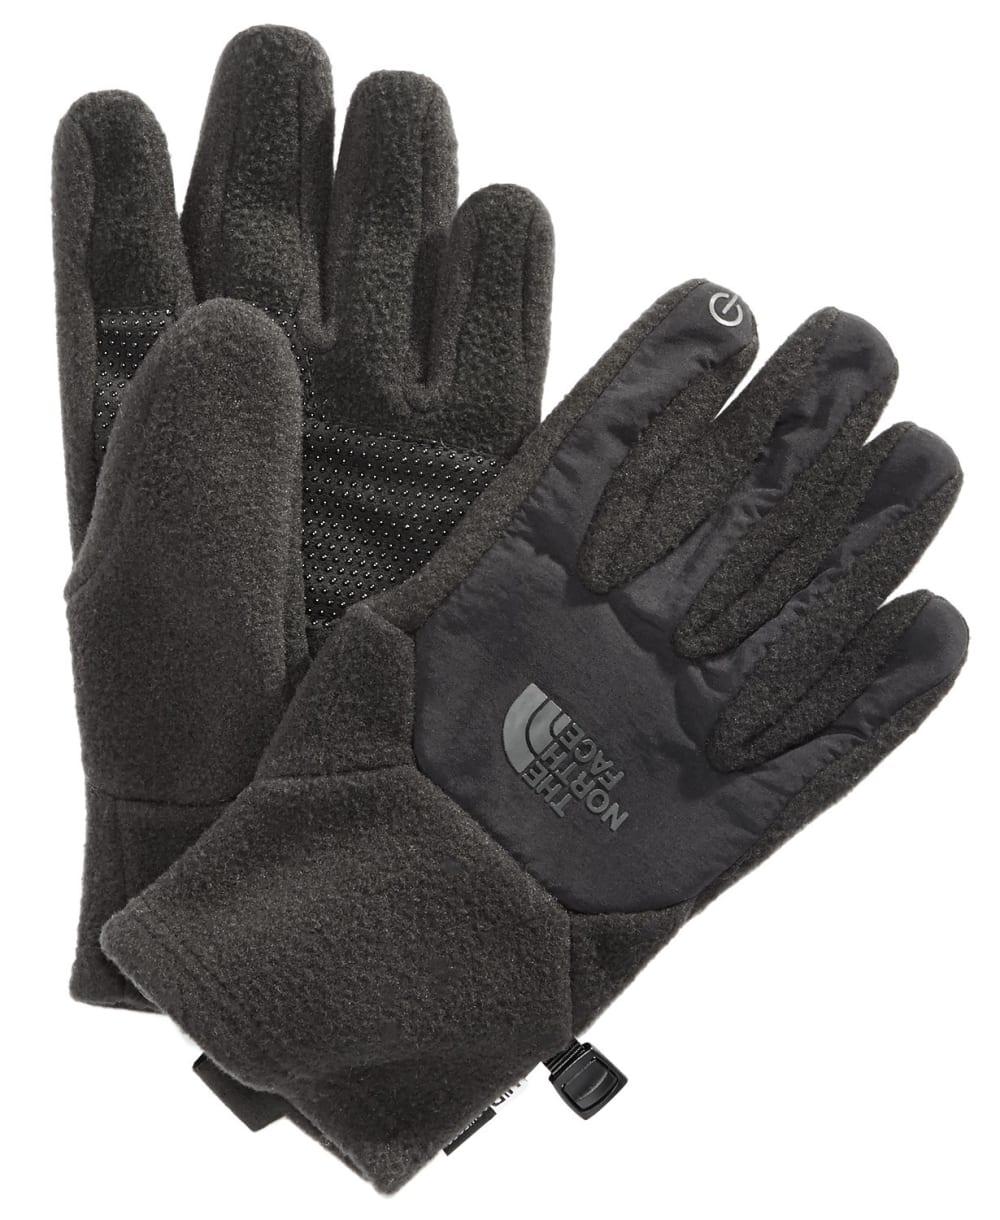 THE NORTH FACE Kids' Denali Etip™ Gloves - GVD-TNF MED GREY